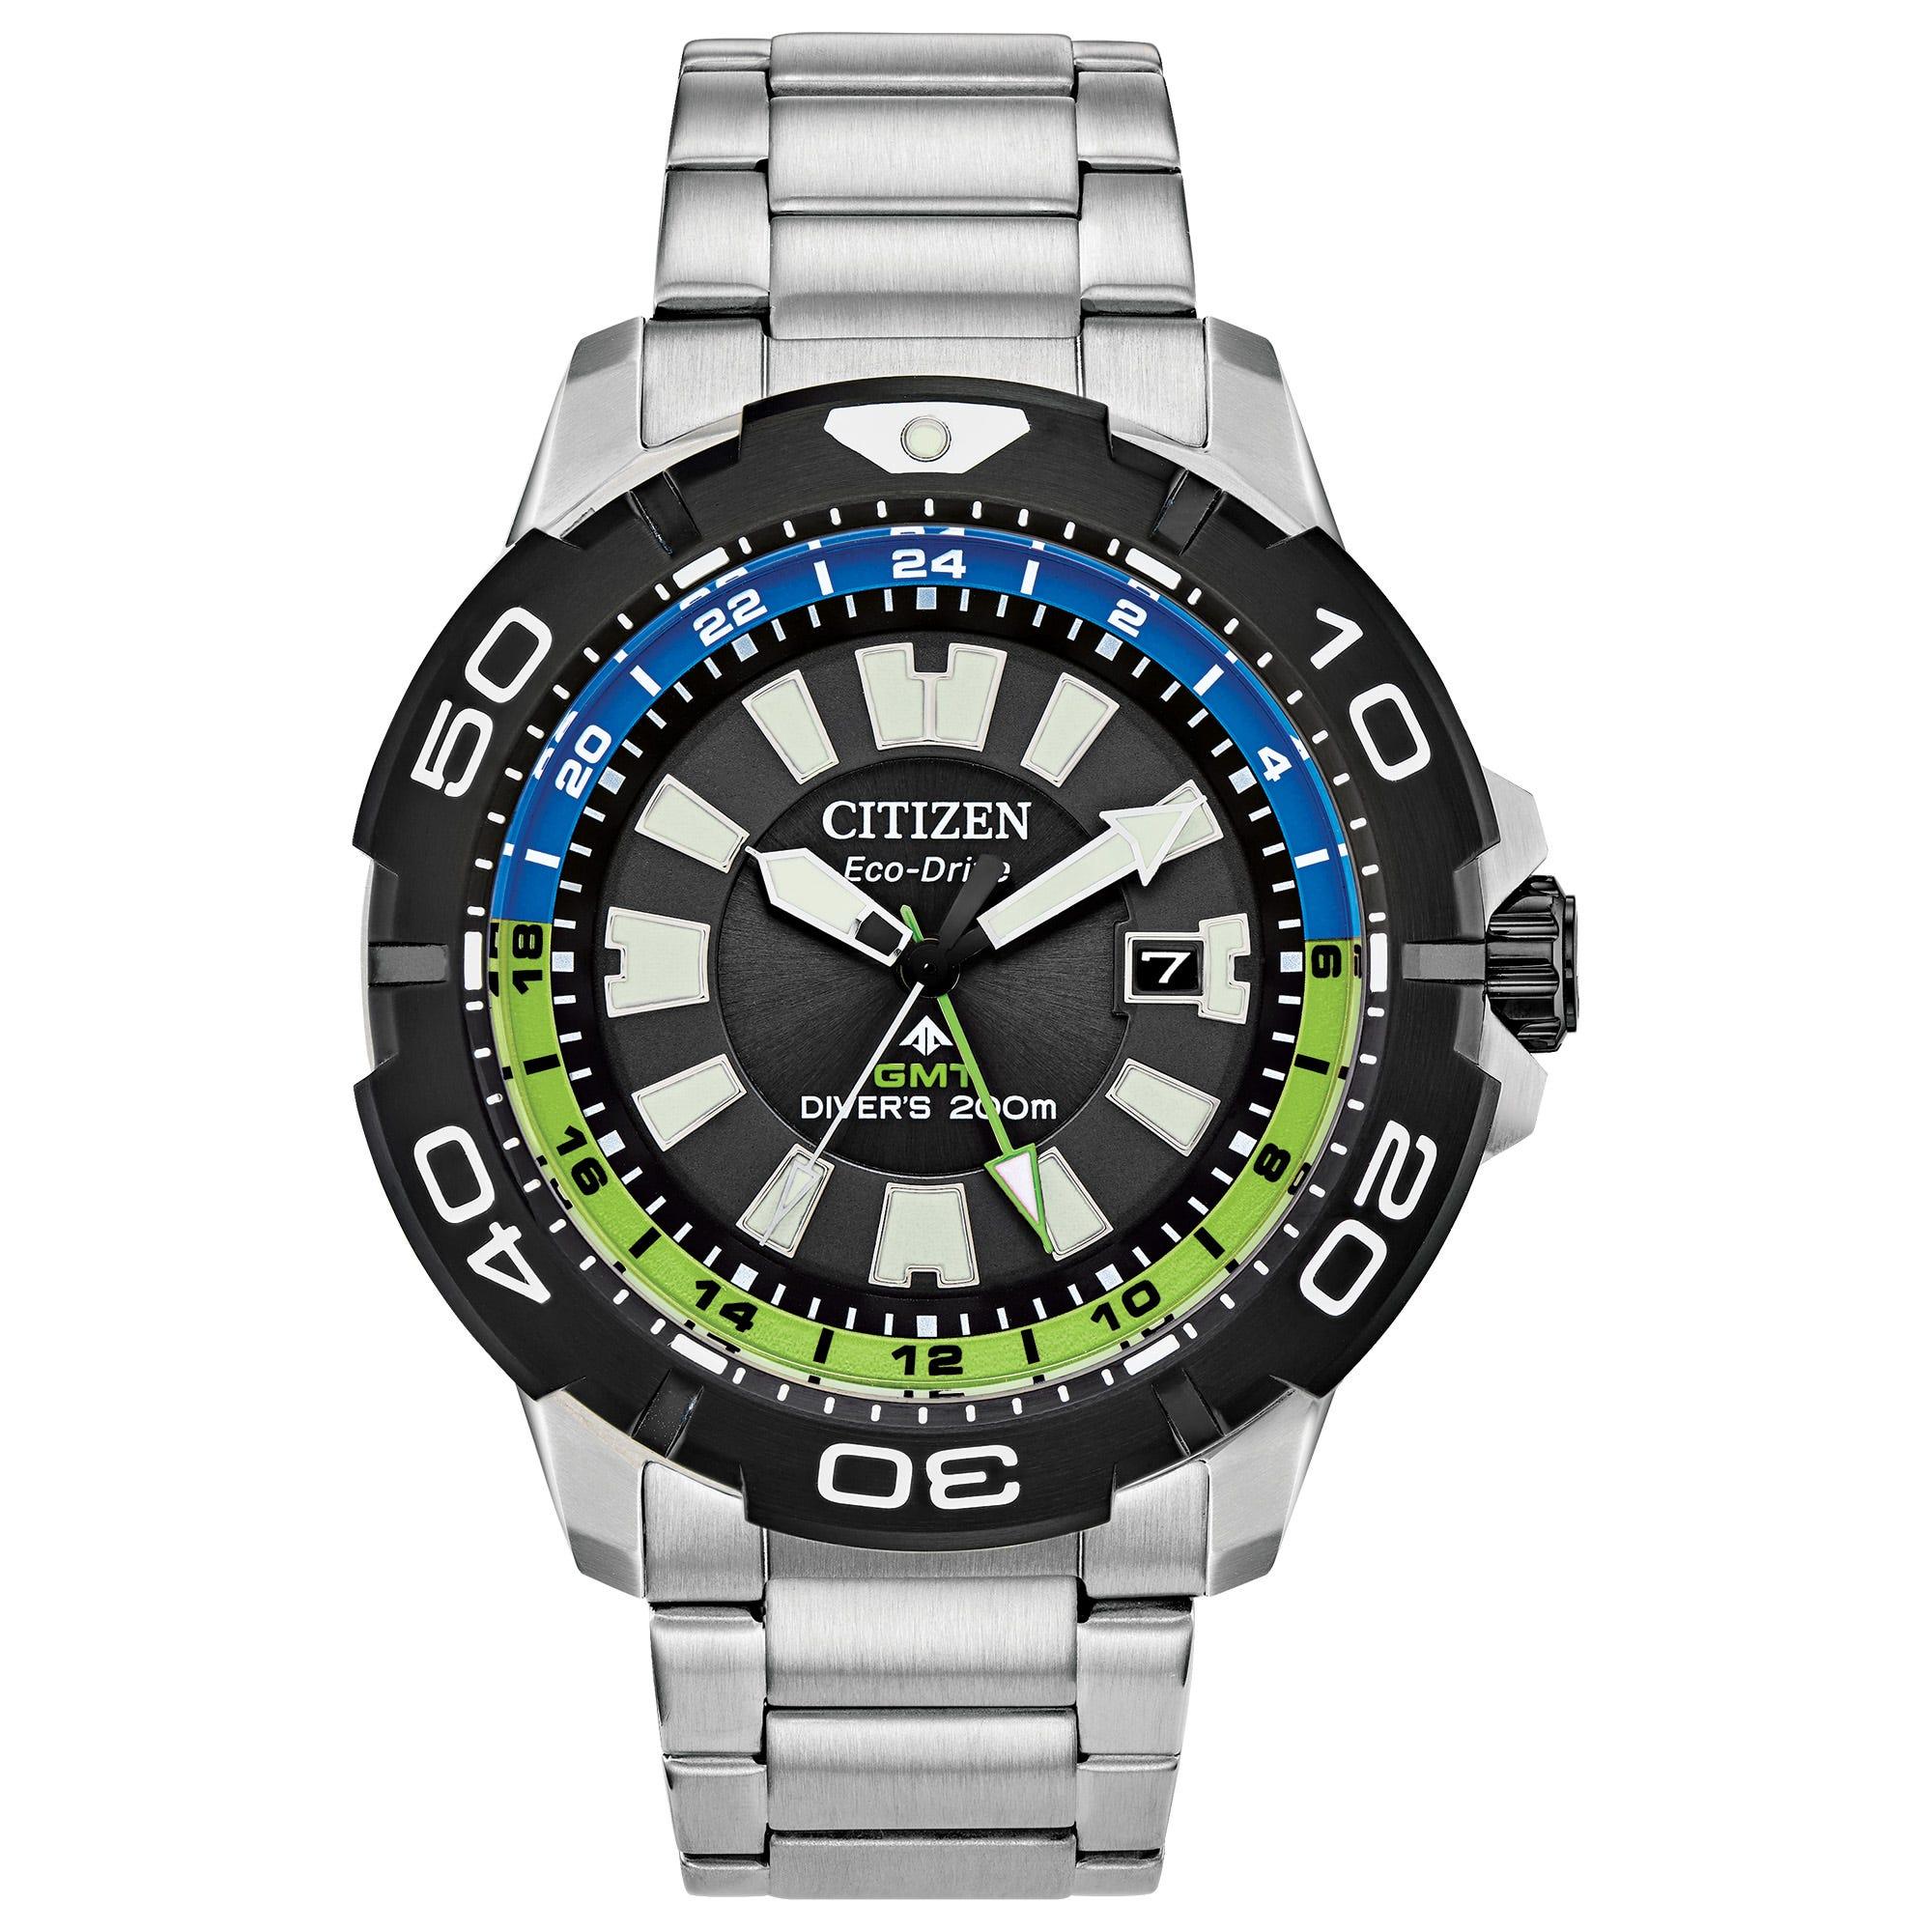 Citizen Men's Promaster GMT Watch BJ7128-59G